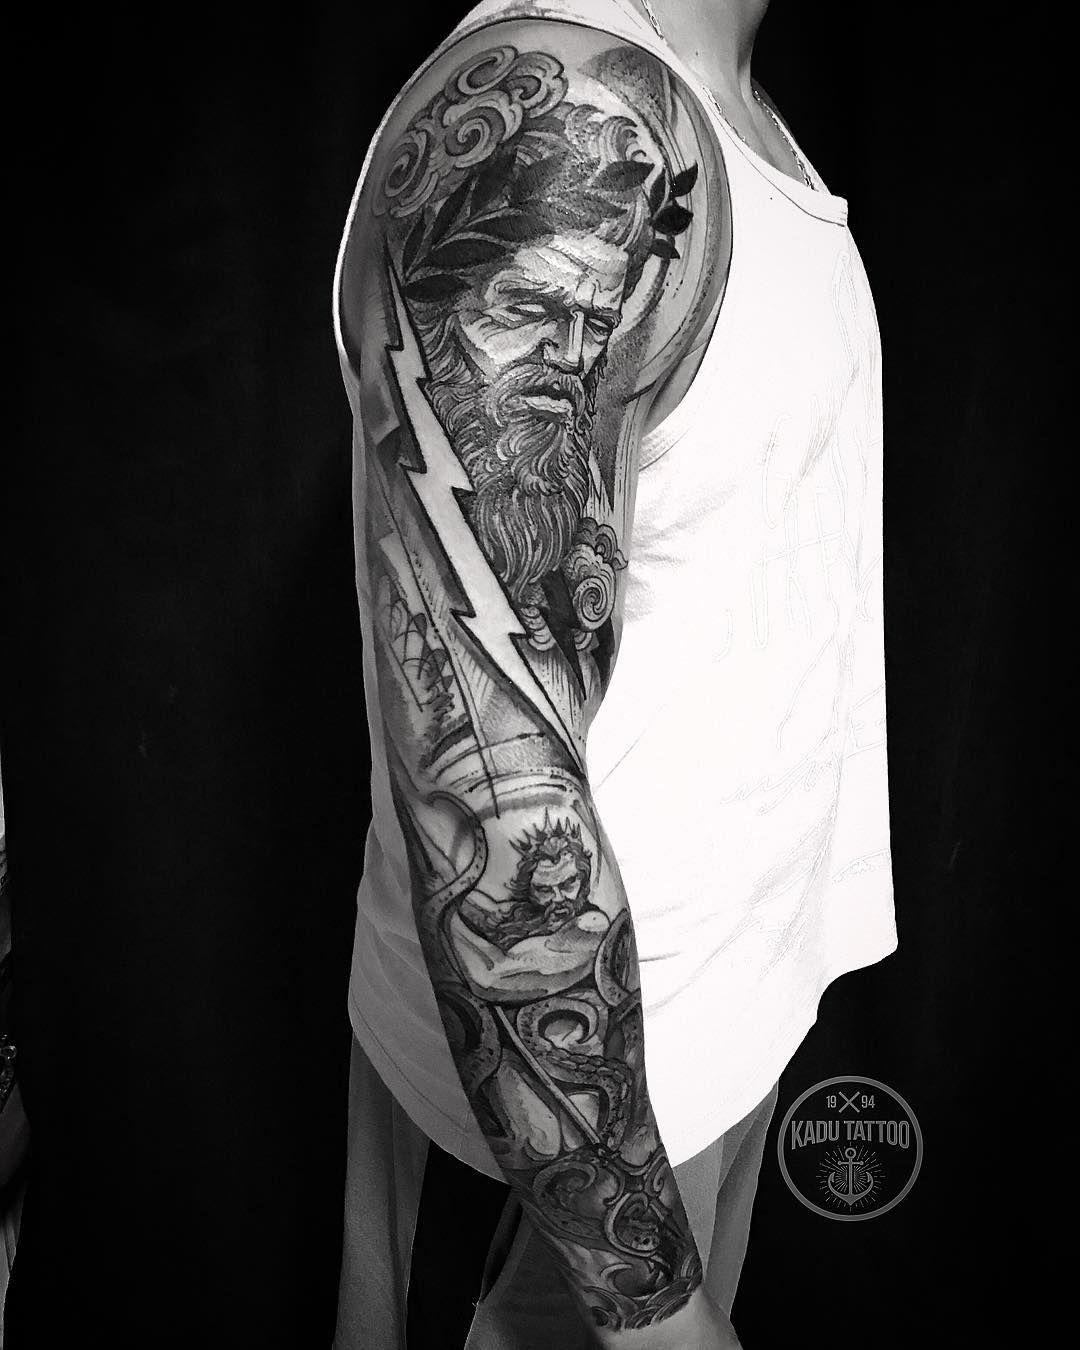 Pin By Edward Carr On Tattoo Ideas Tattoos Poseidon Tattoo Zeus